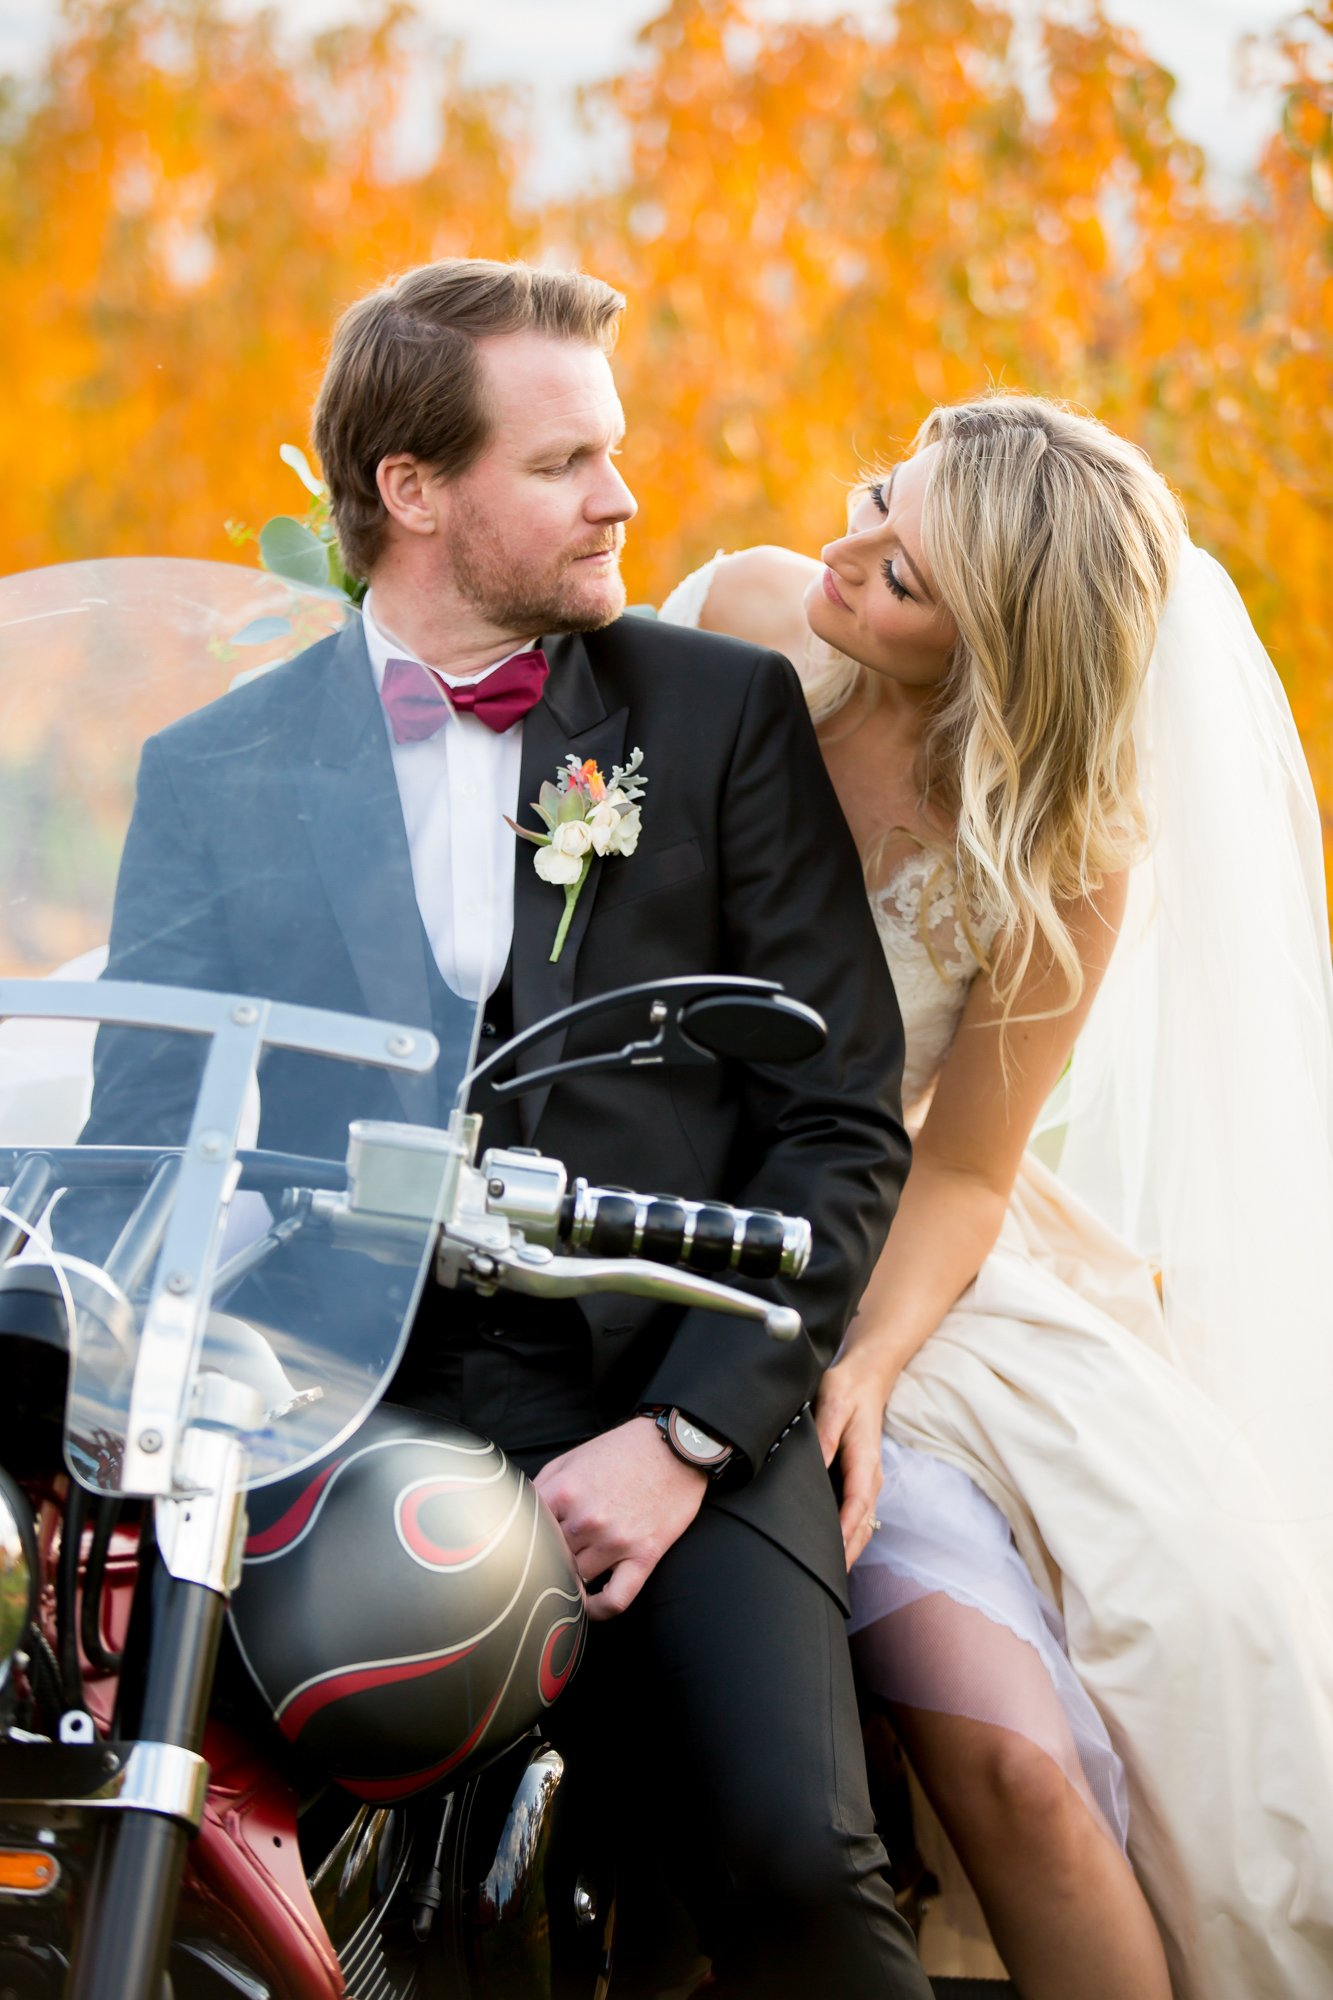 A couple sitting otgether on a motorbike